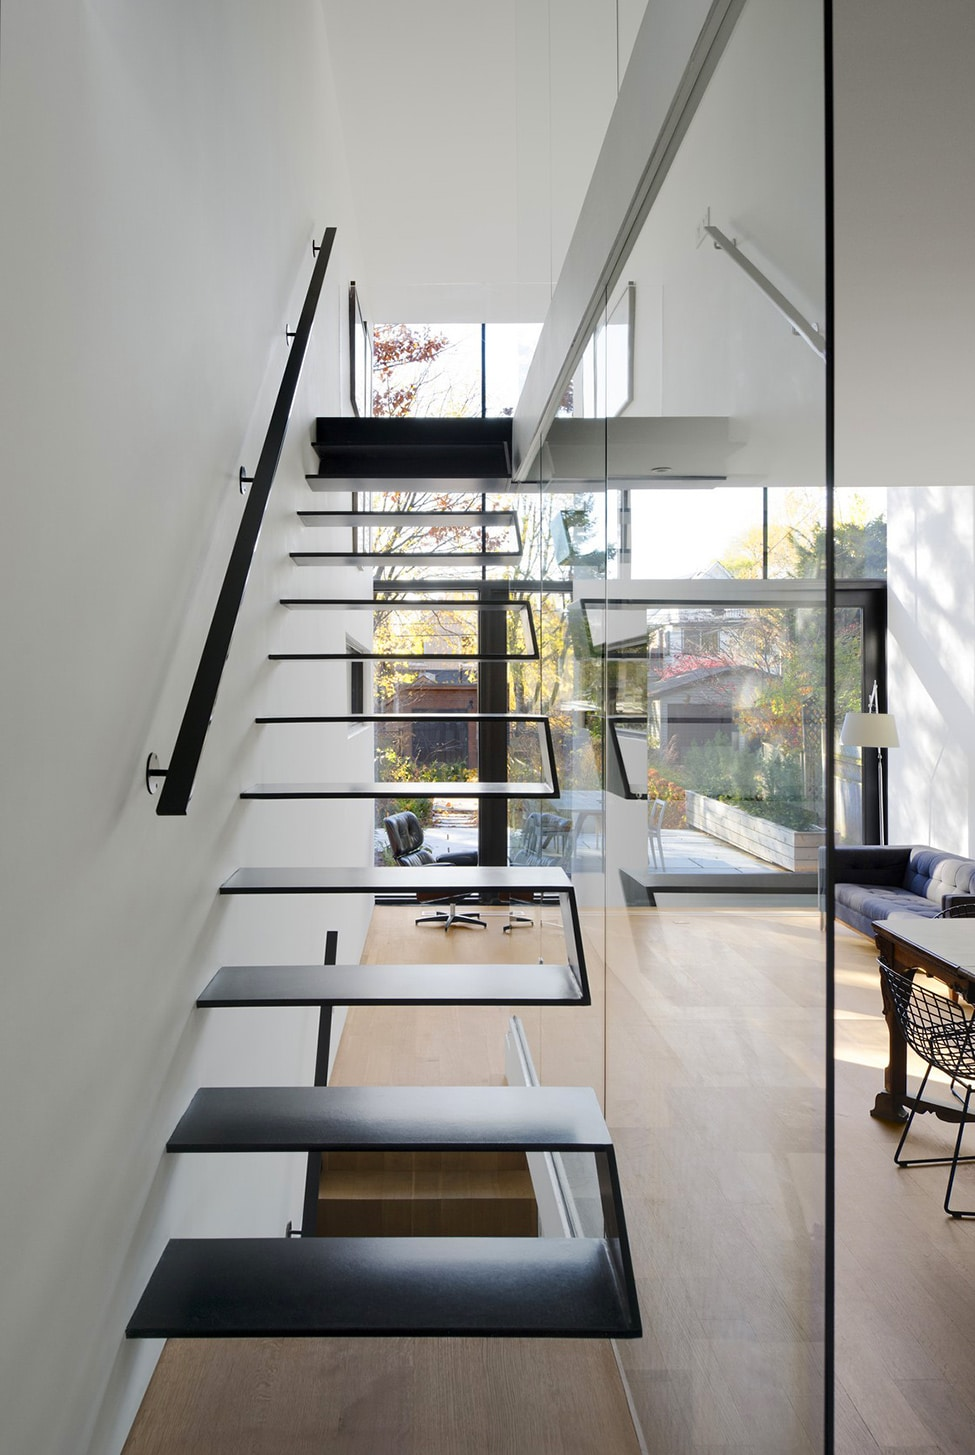 Planos de casa angosta y larga construye hogar for Planos de interiores de casas